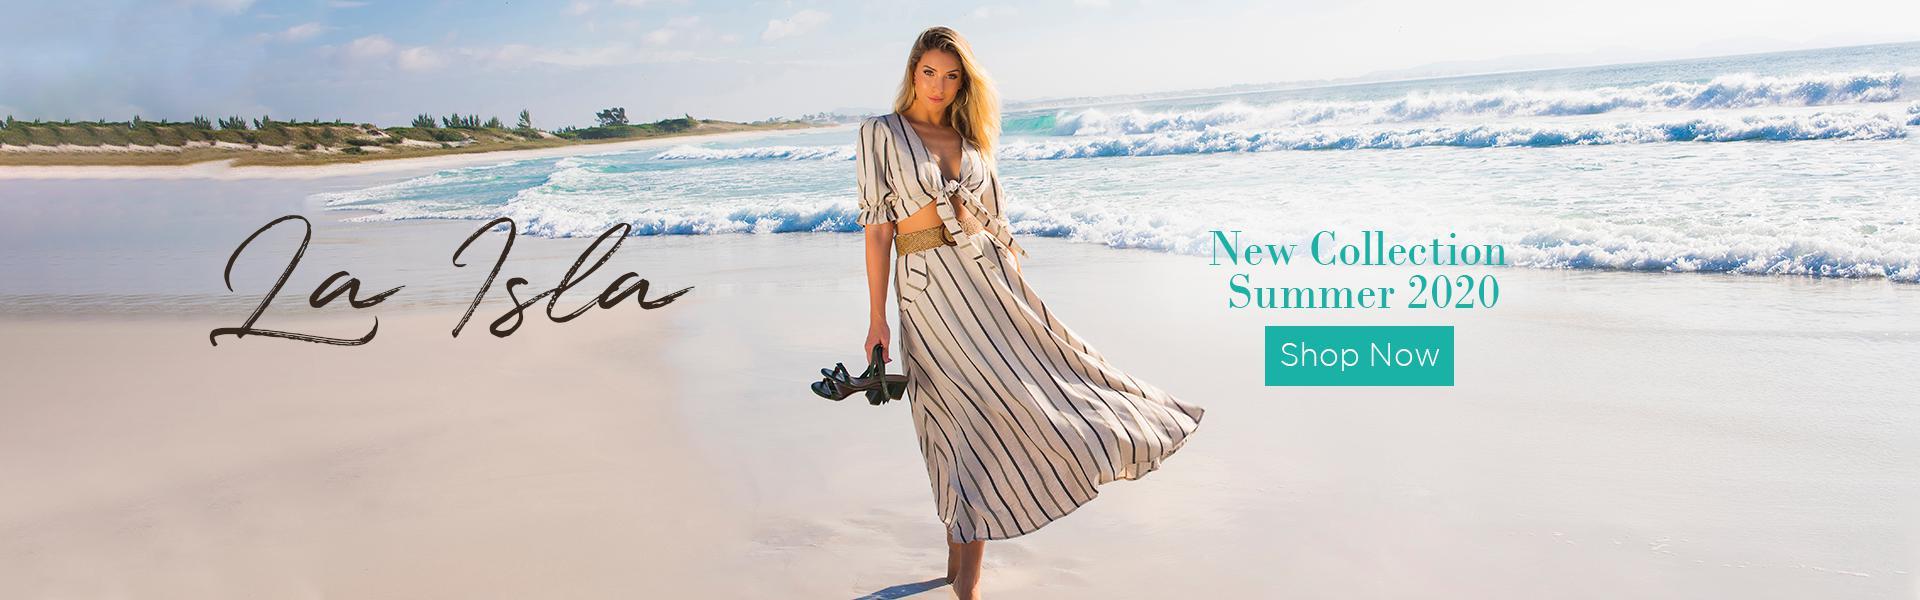 La Isla - Summer Collection 2020